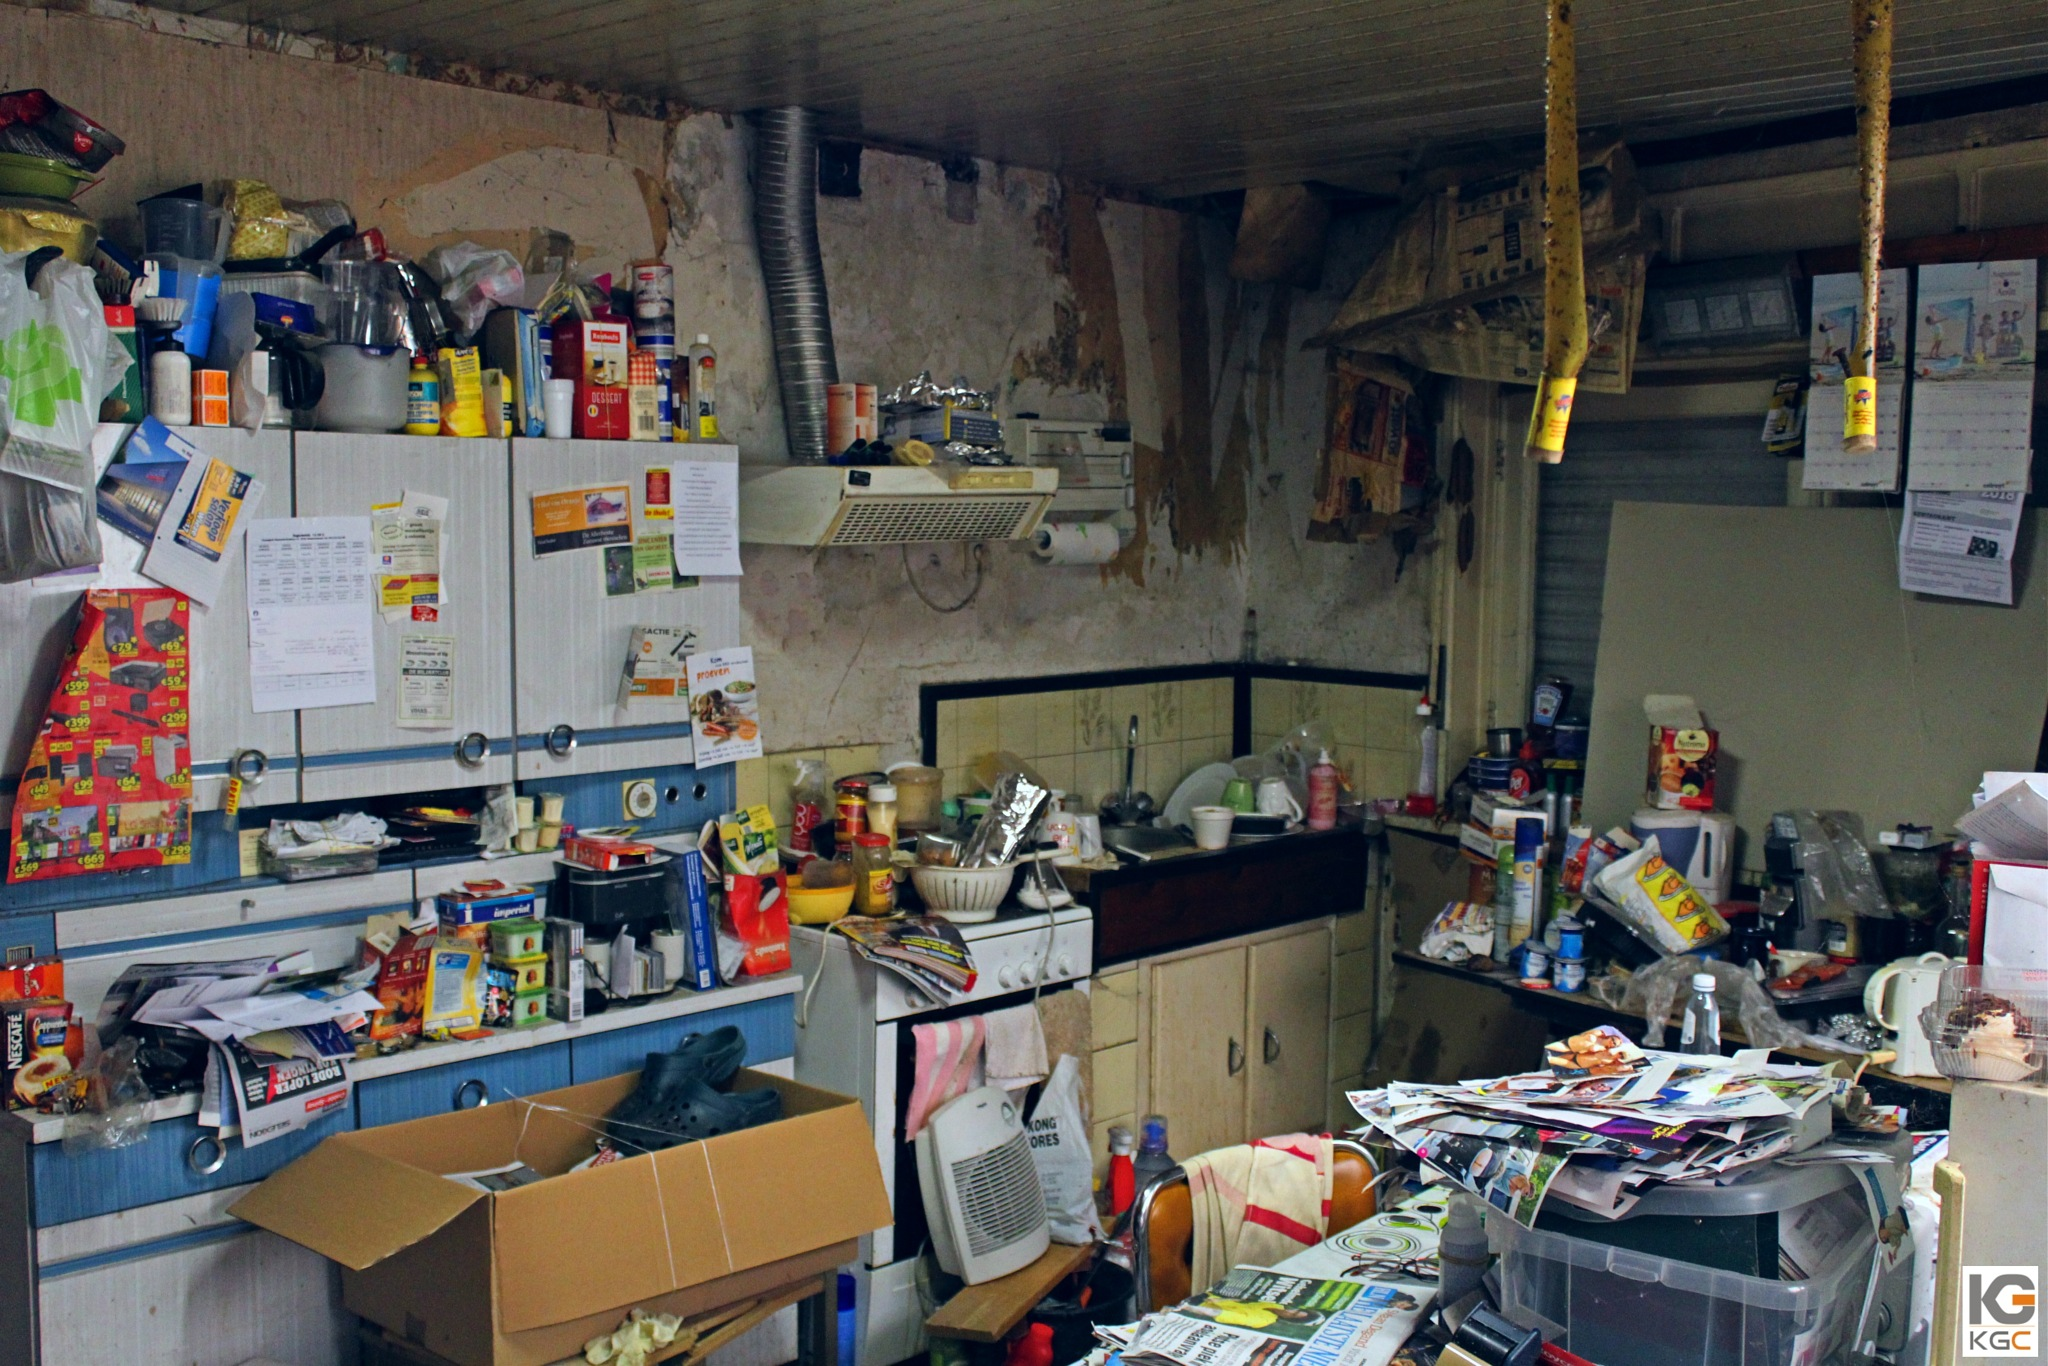 Kitchen nightmare by Karel Geerts